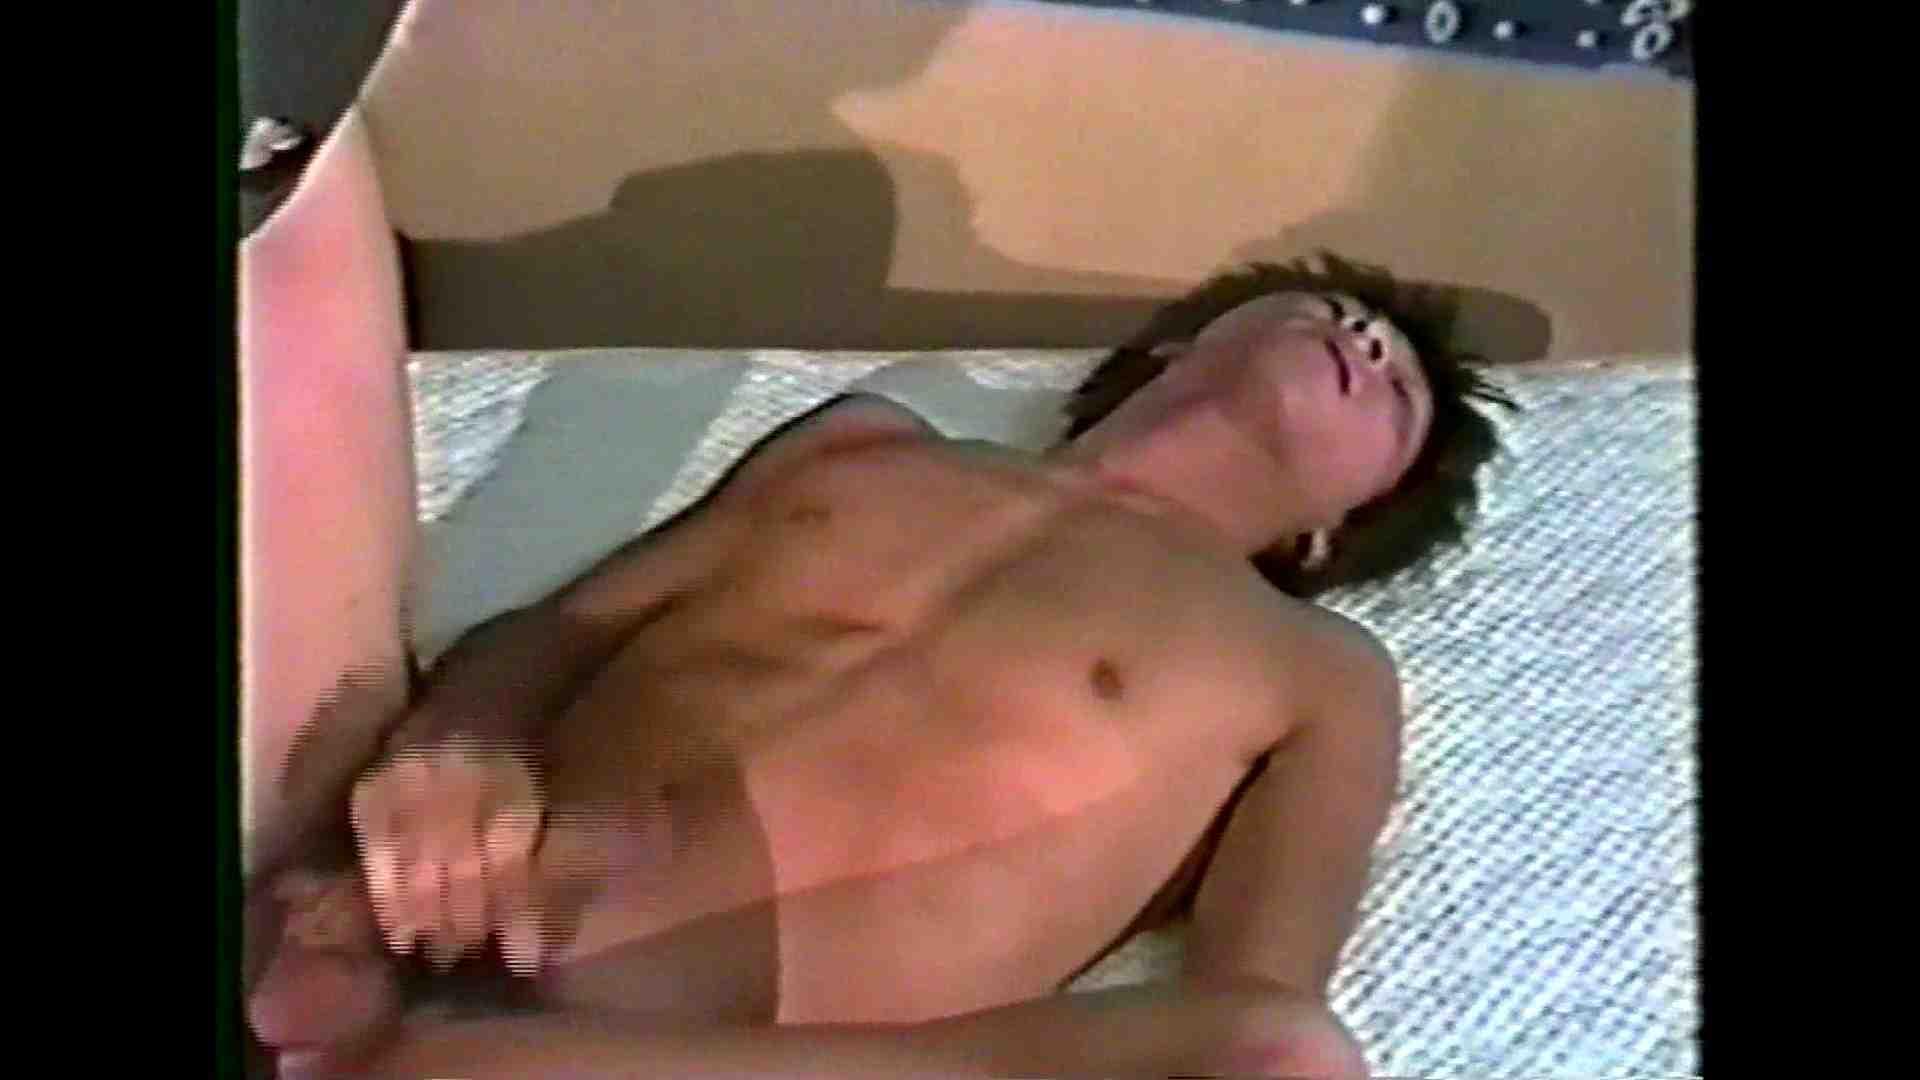 GAYBOY宏のオカズ倉庫Vol.3-4 オナニー | ディープキス アダルトビデオ画像キャプチャ 91pic 51